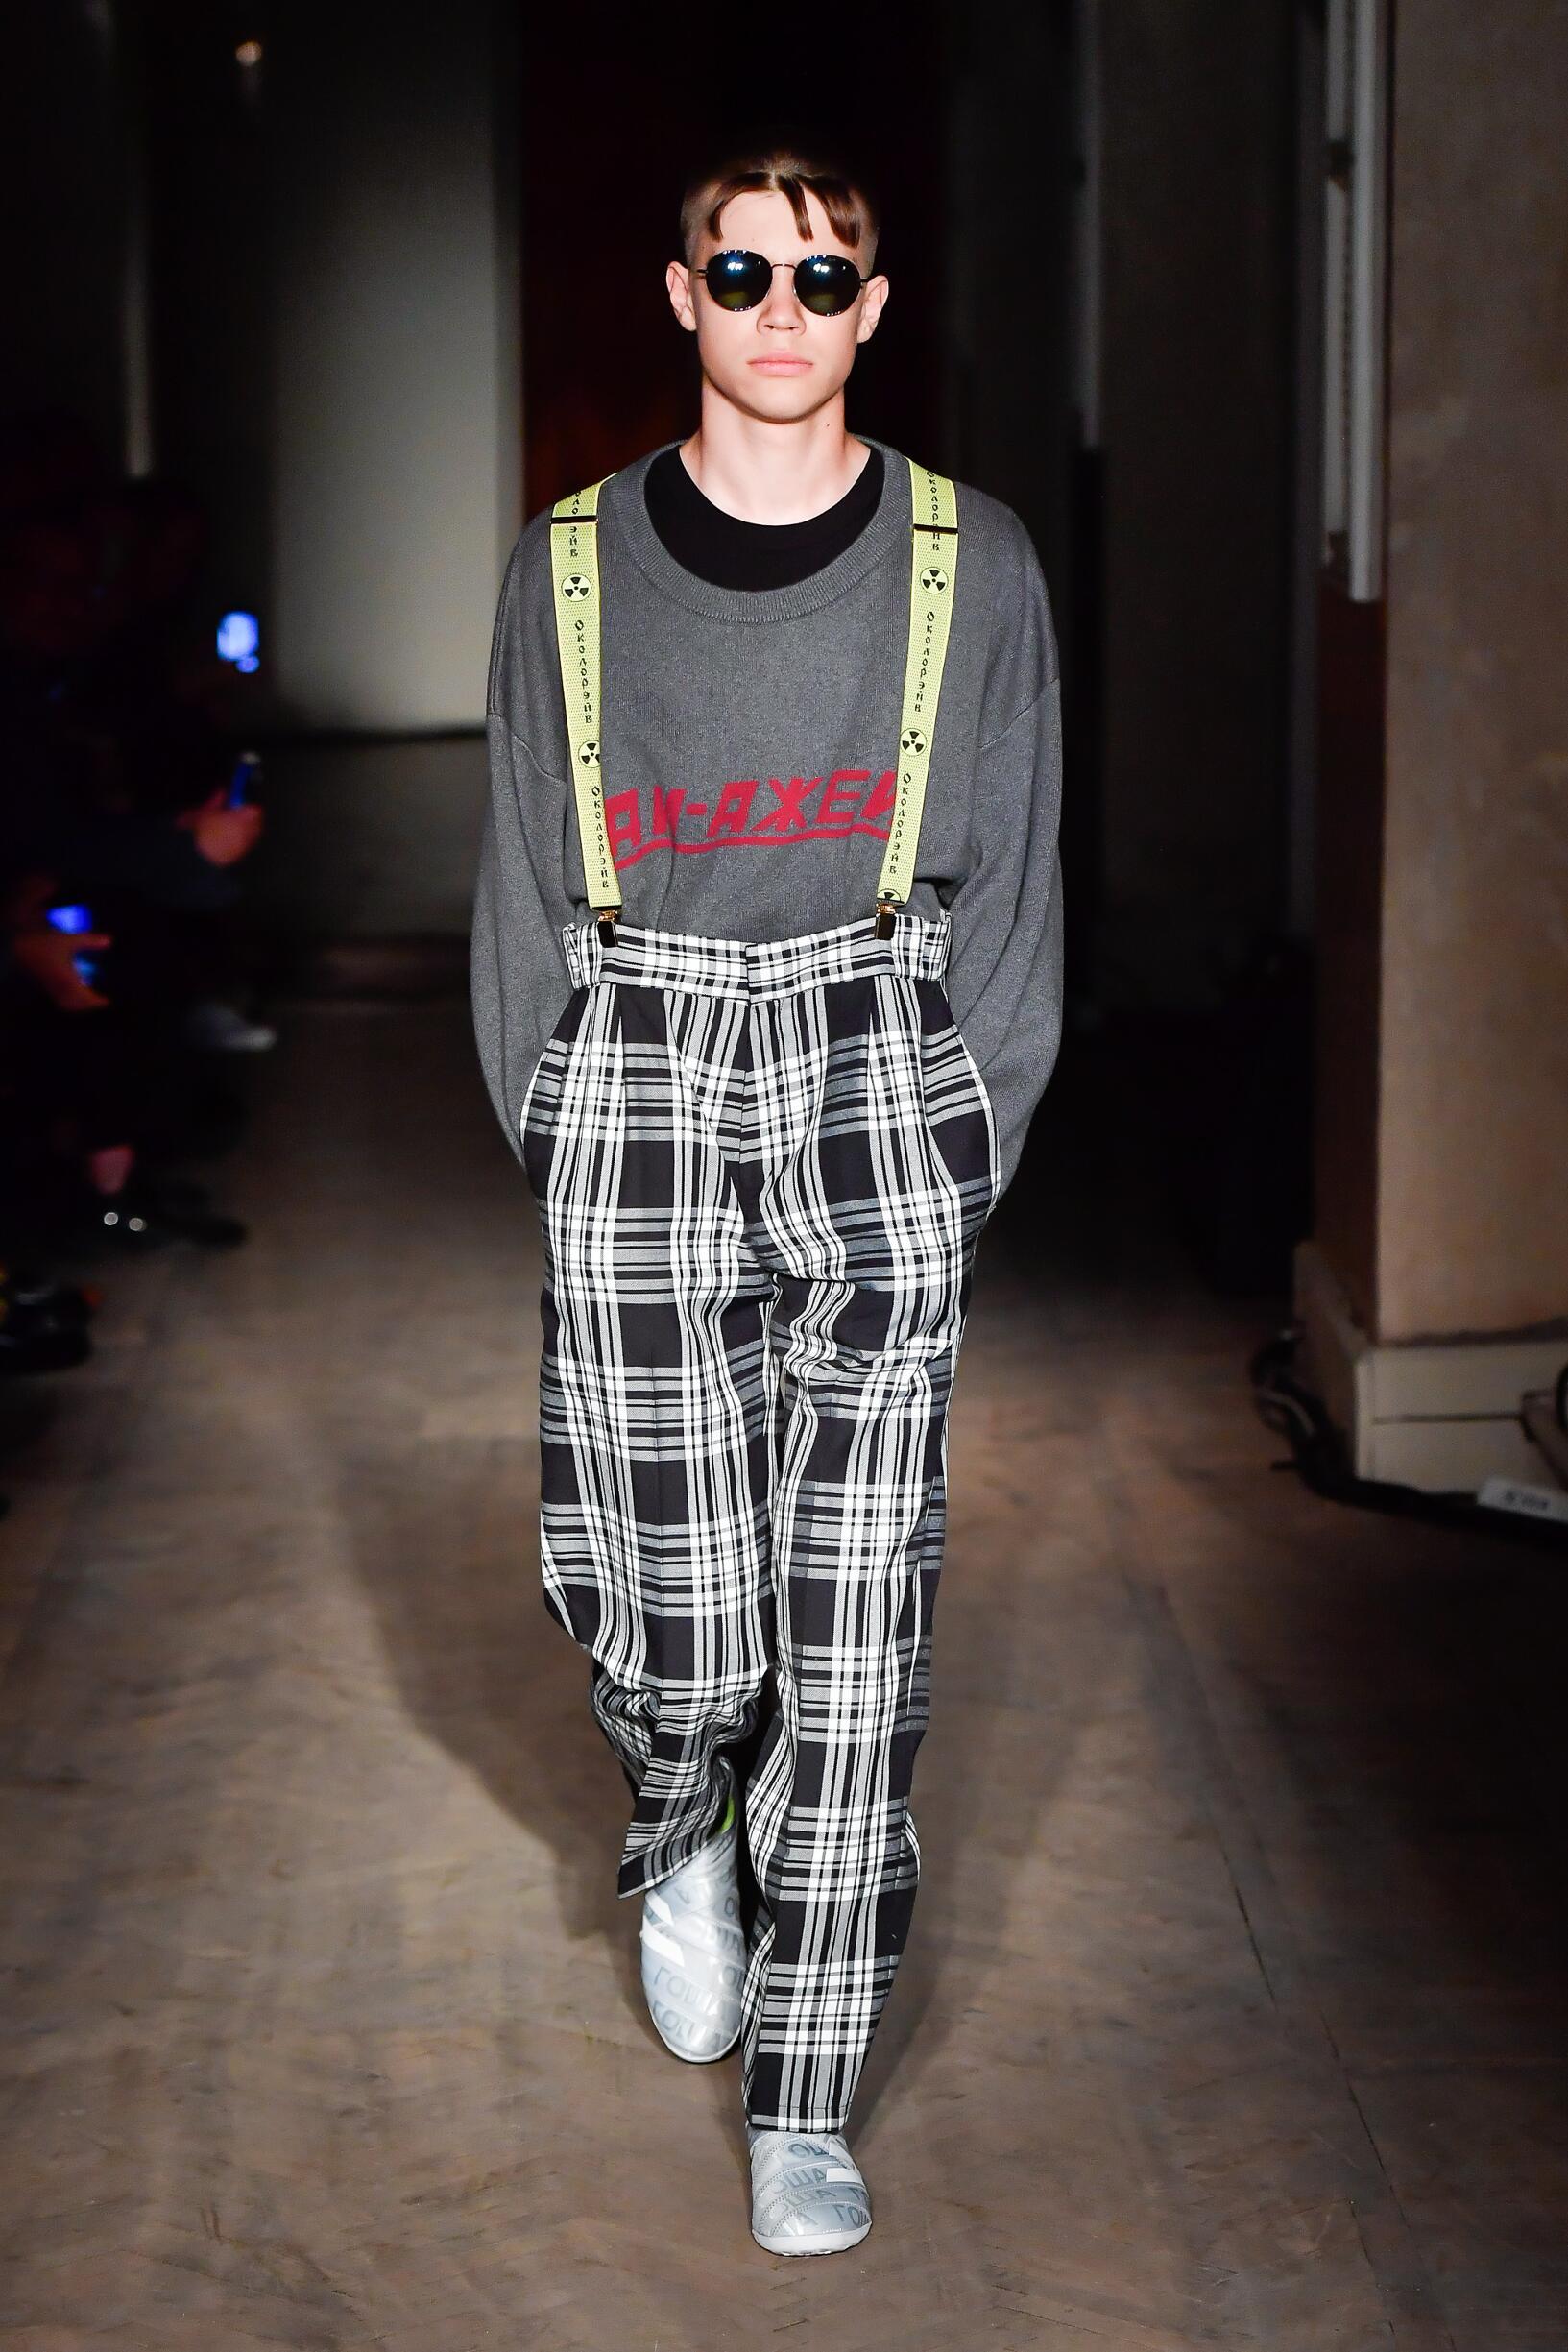 Man SS 2018 Fashion Show Gosha Rubchinskiy